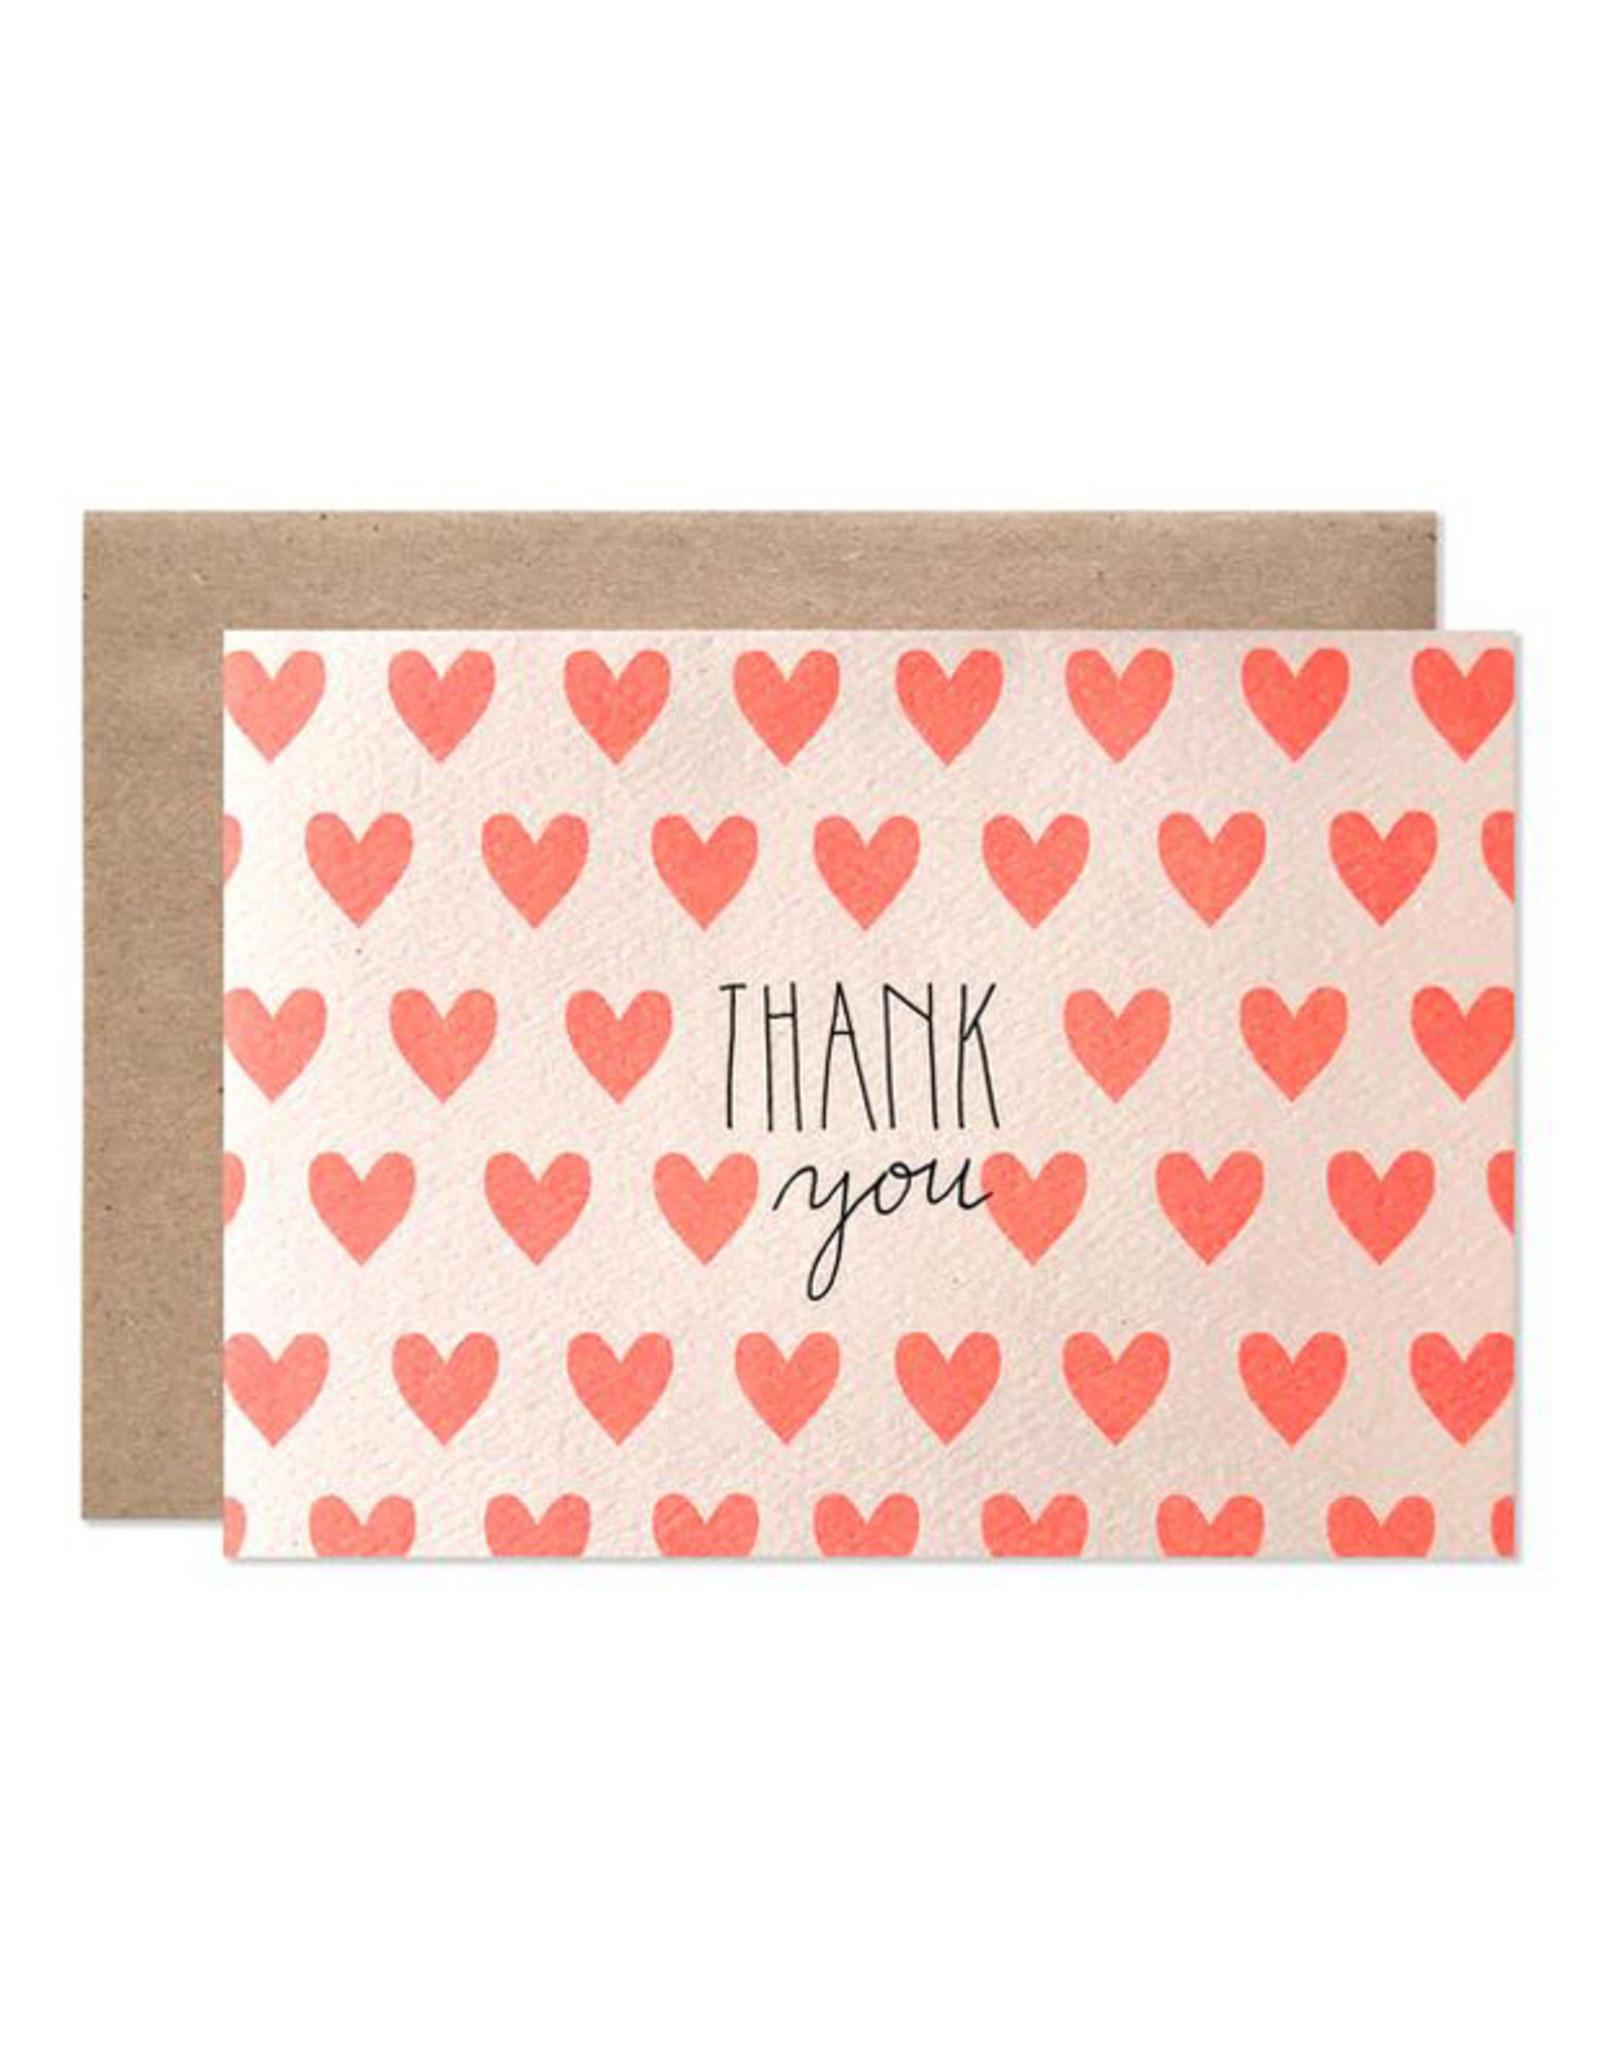 Hartland Brooklyn Boxed Cards - Thank You Neon Hearts (8)